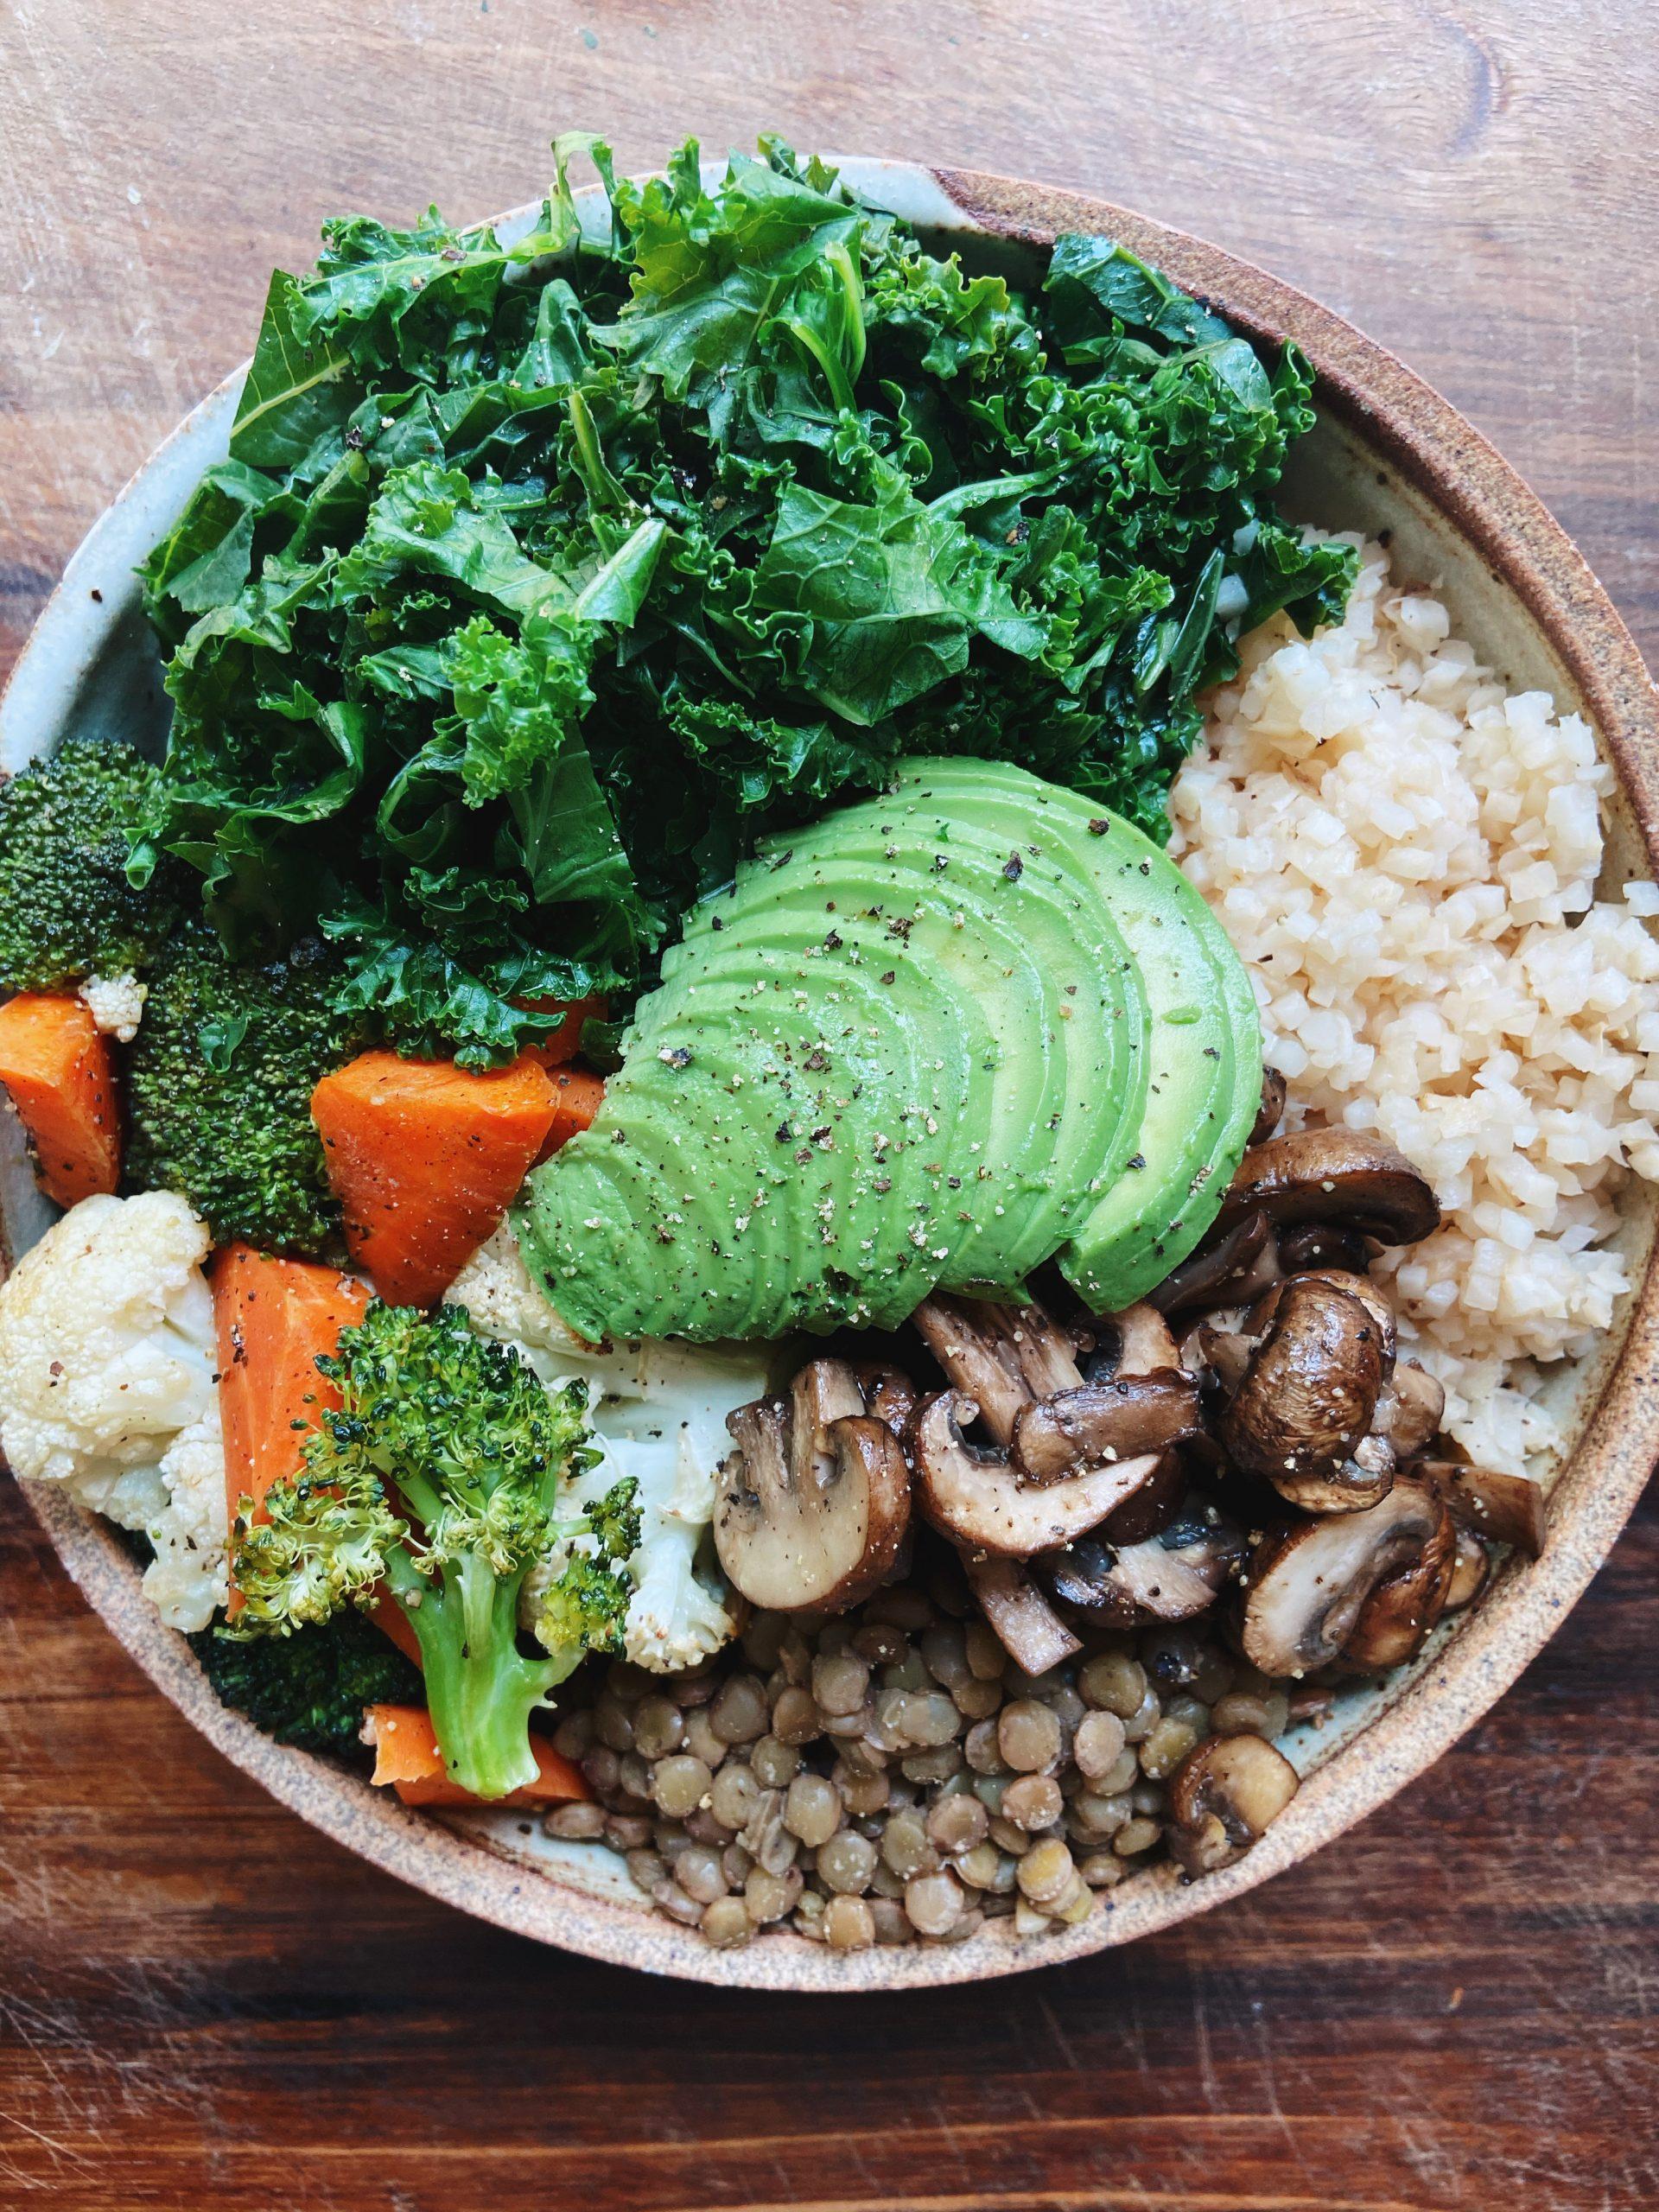 buddha bowl with kale, brown rice, lentils, mushrooms, roasted veggies and avocado